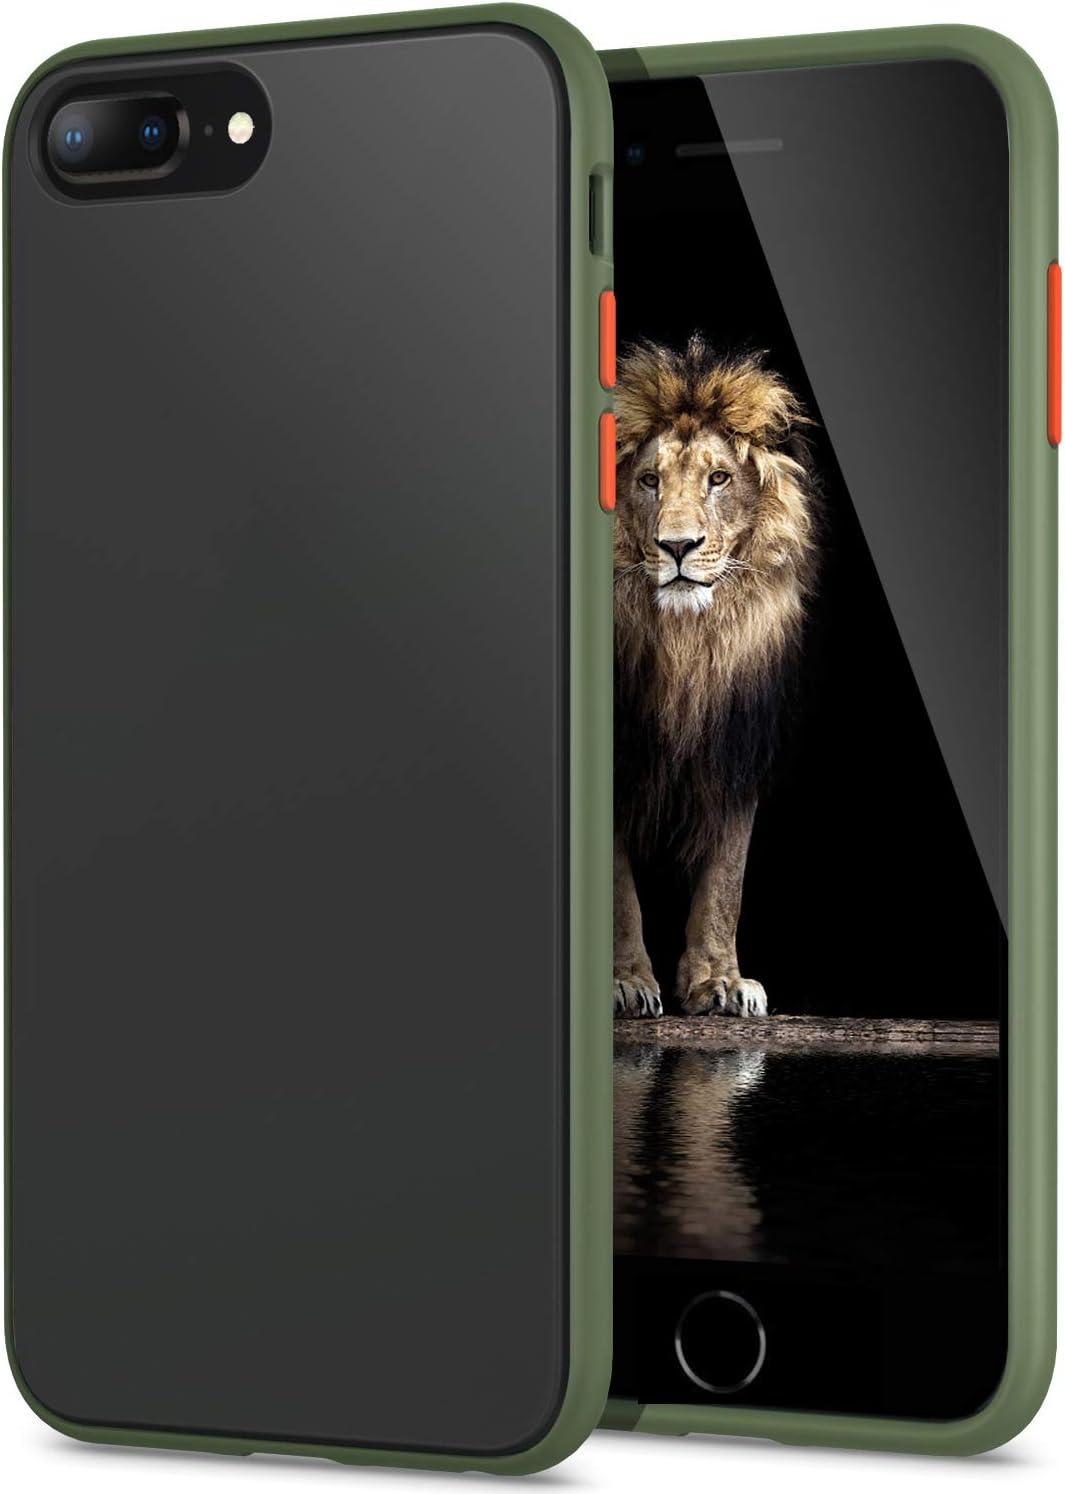 YATWIN Funda para iPhone 8 Plus, Funda iPhone 7 Plus Transparente Mate Case, [Shockproof Style] TPU Bumper Rubber y Botones Coloridos, Carcasa Protectora para Funda iPhone 7/8 Plus - Verde Noche